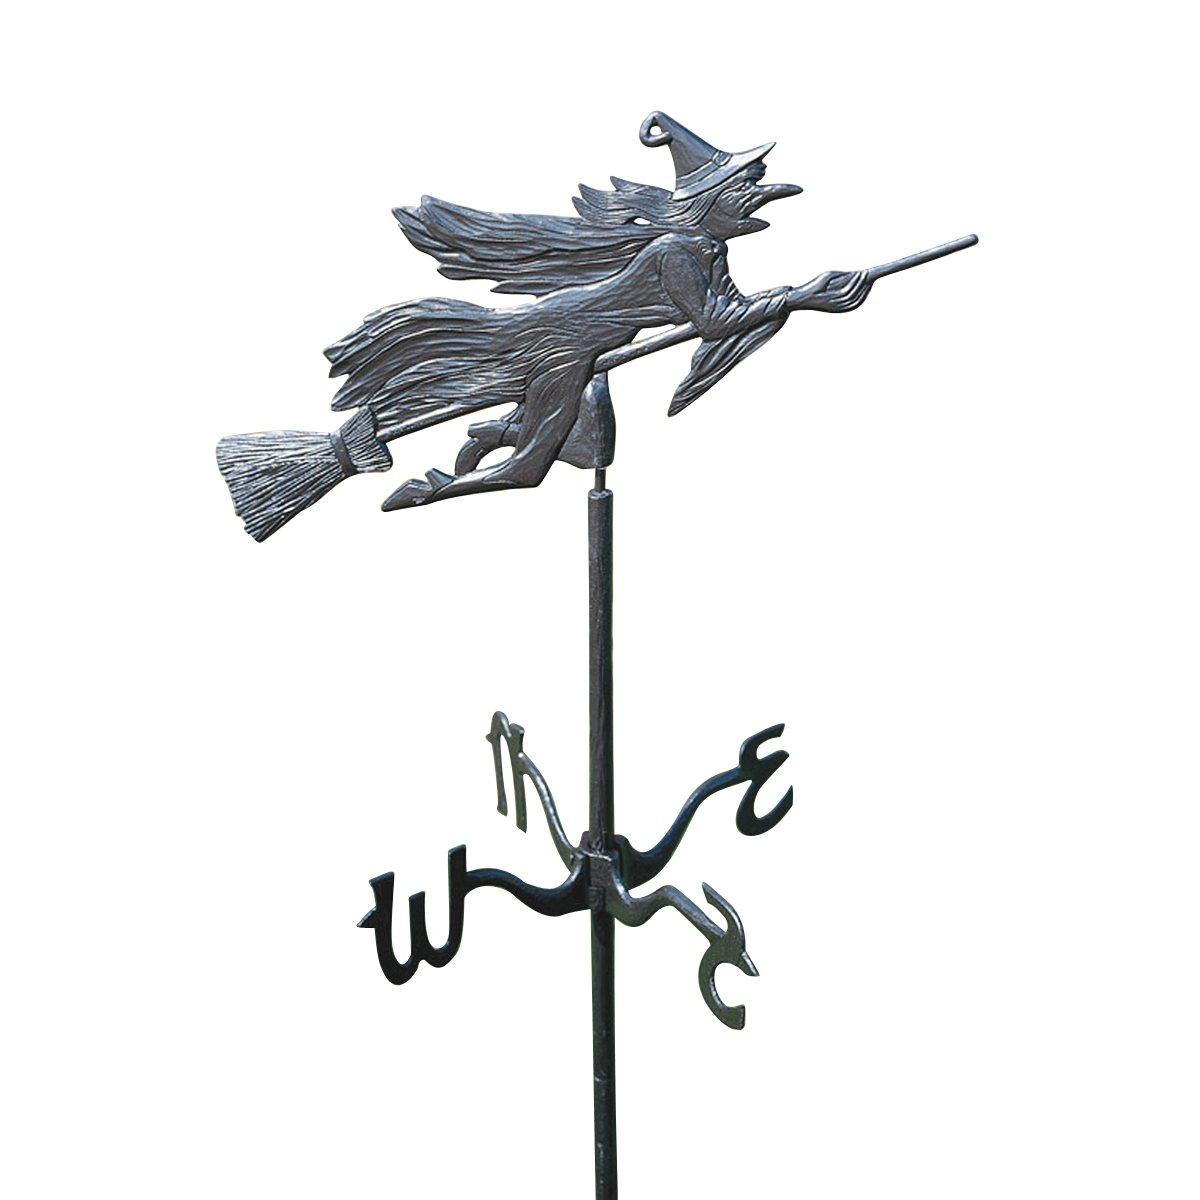 Design Toscano Windblown Wicked Witch Metal Weathervane with Garden Stake, 66 Inch, Aluminum, Black